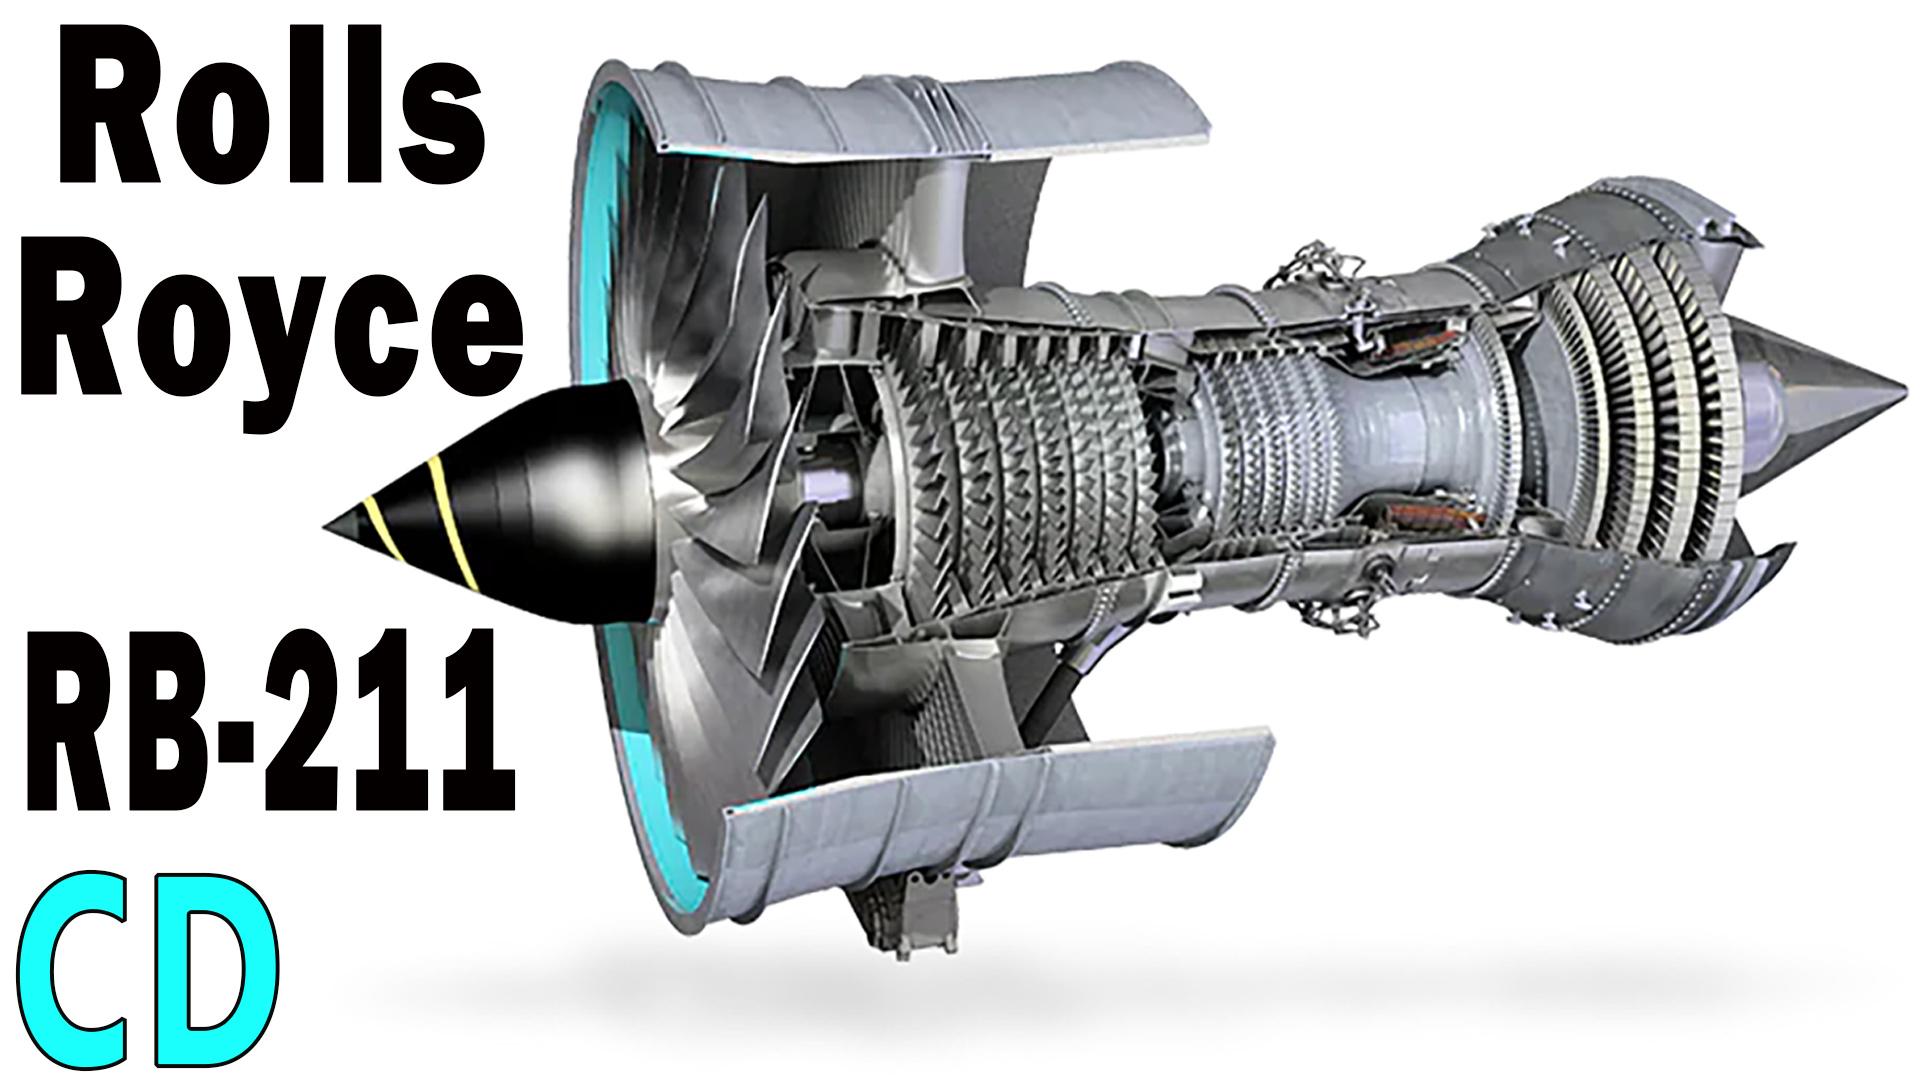 Rolls Royce RB211